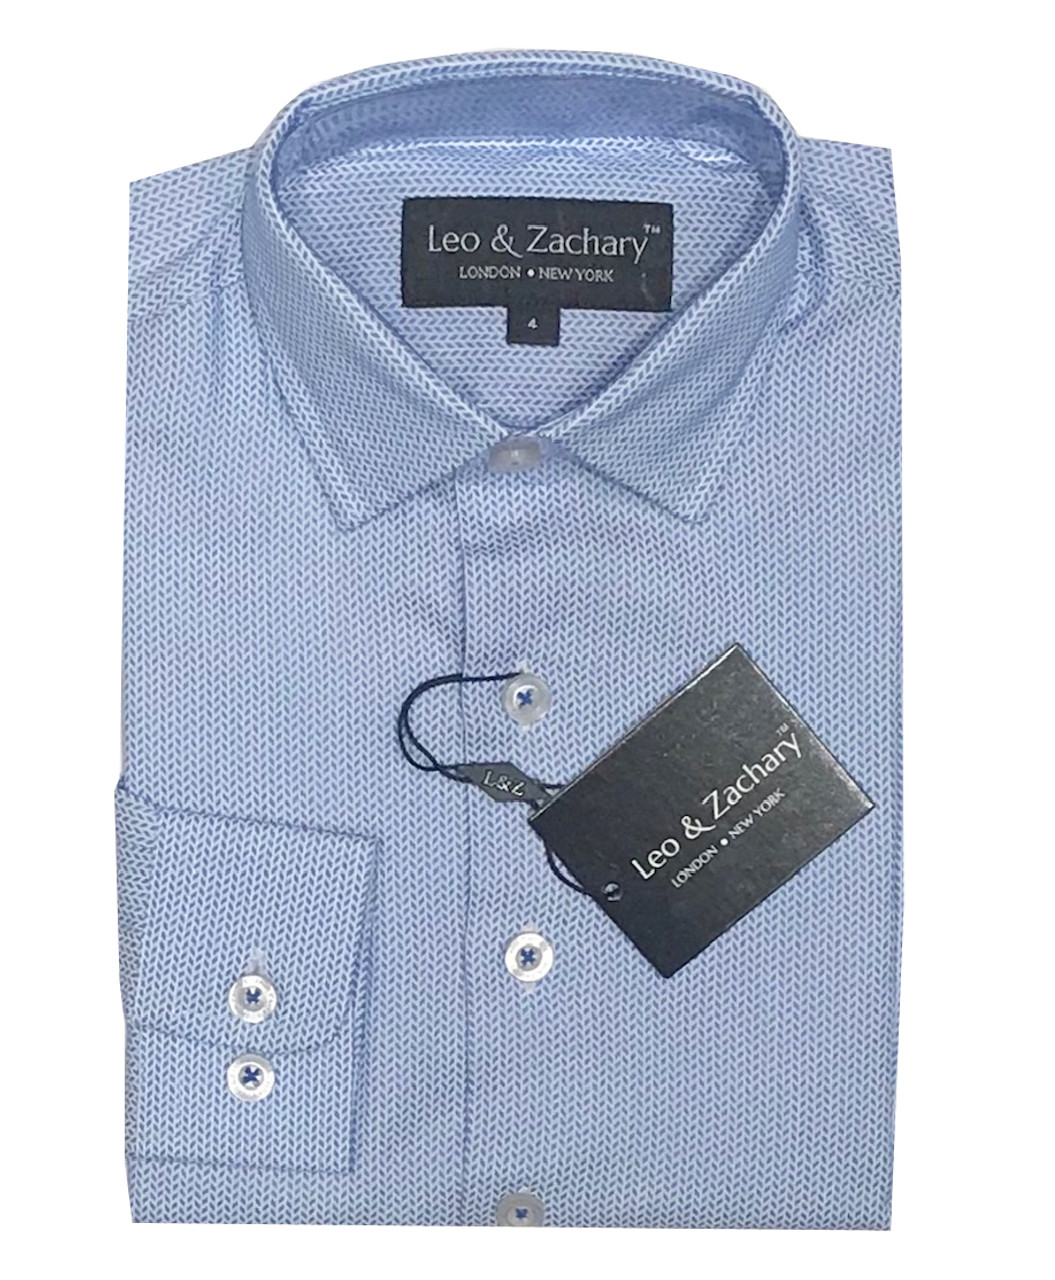 Leo & Zachary Shirt Dodger/Blue 5667